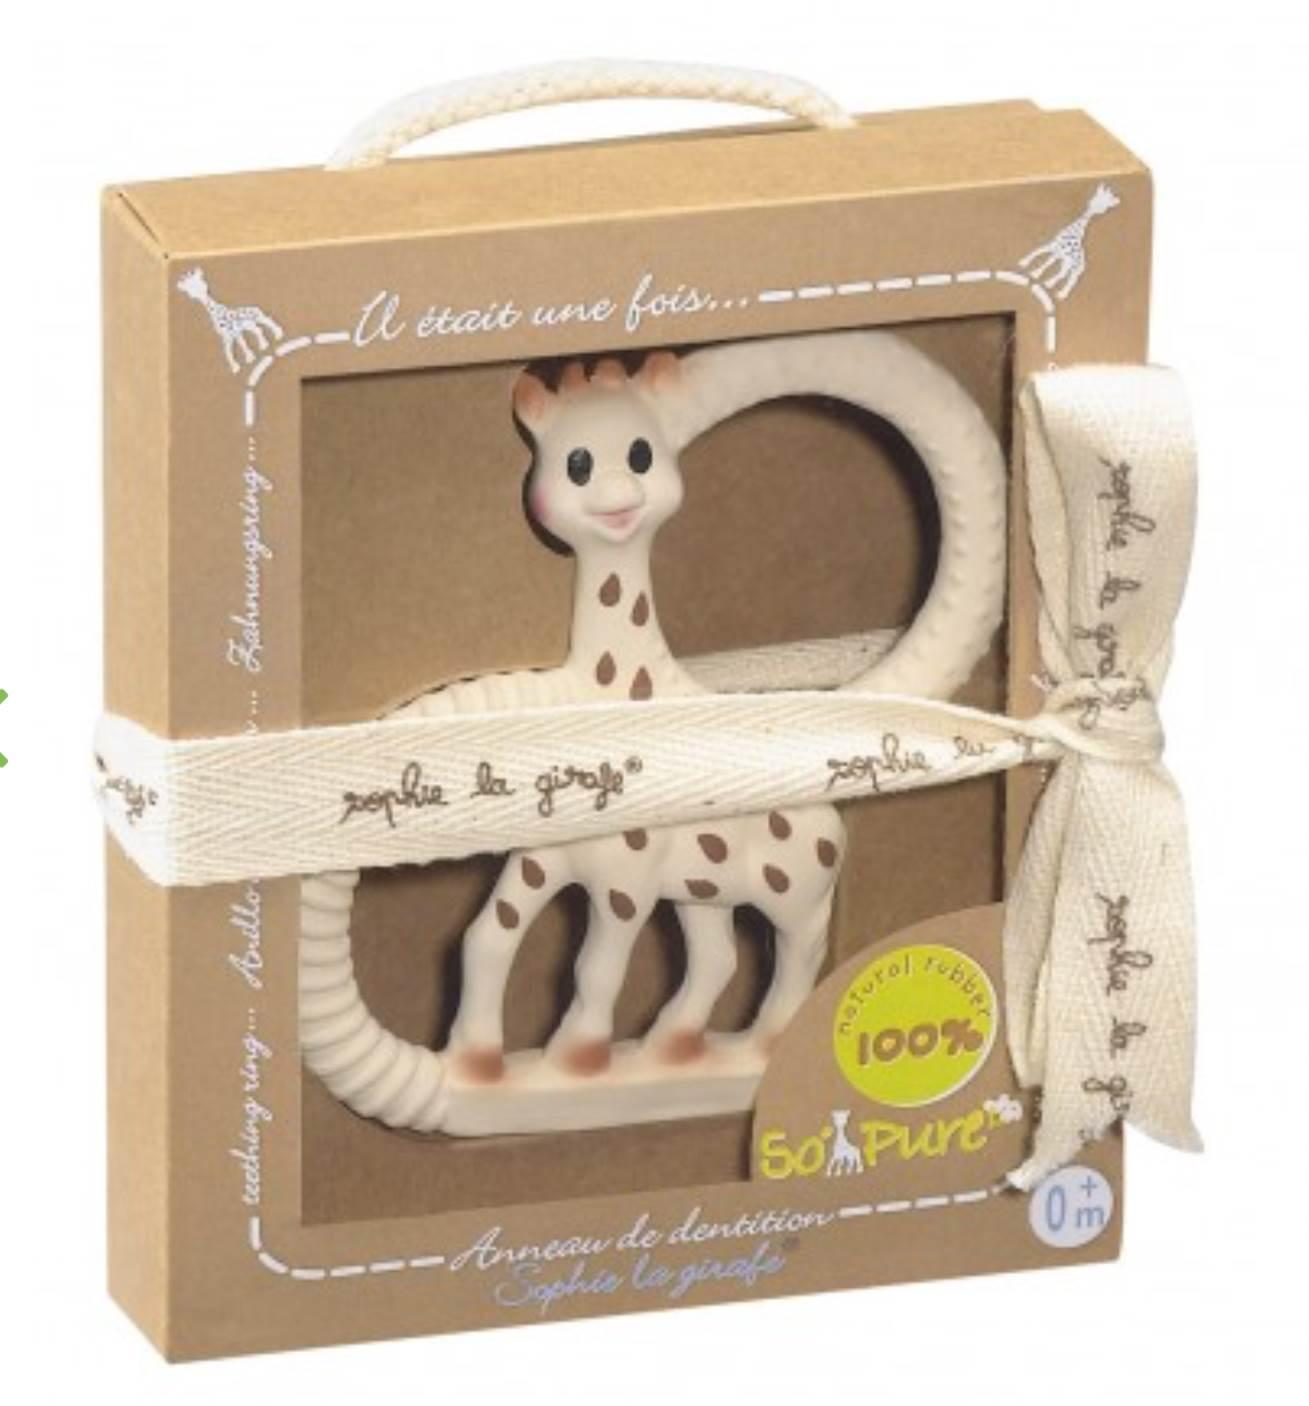 Anillo de dentición SO PURE Sophie la girafe (de goma natural) Versión extra blanda